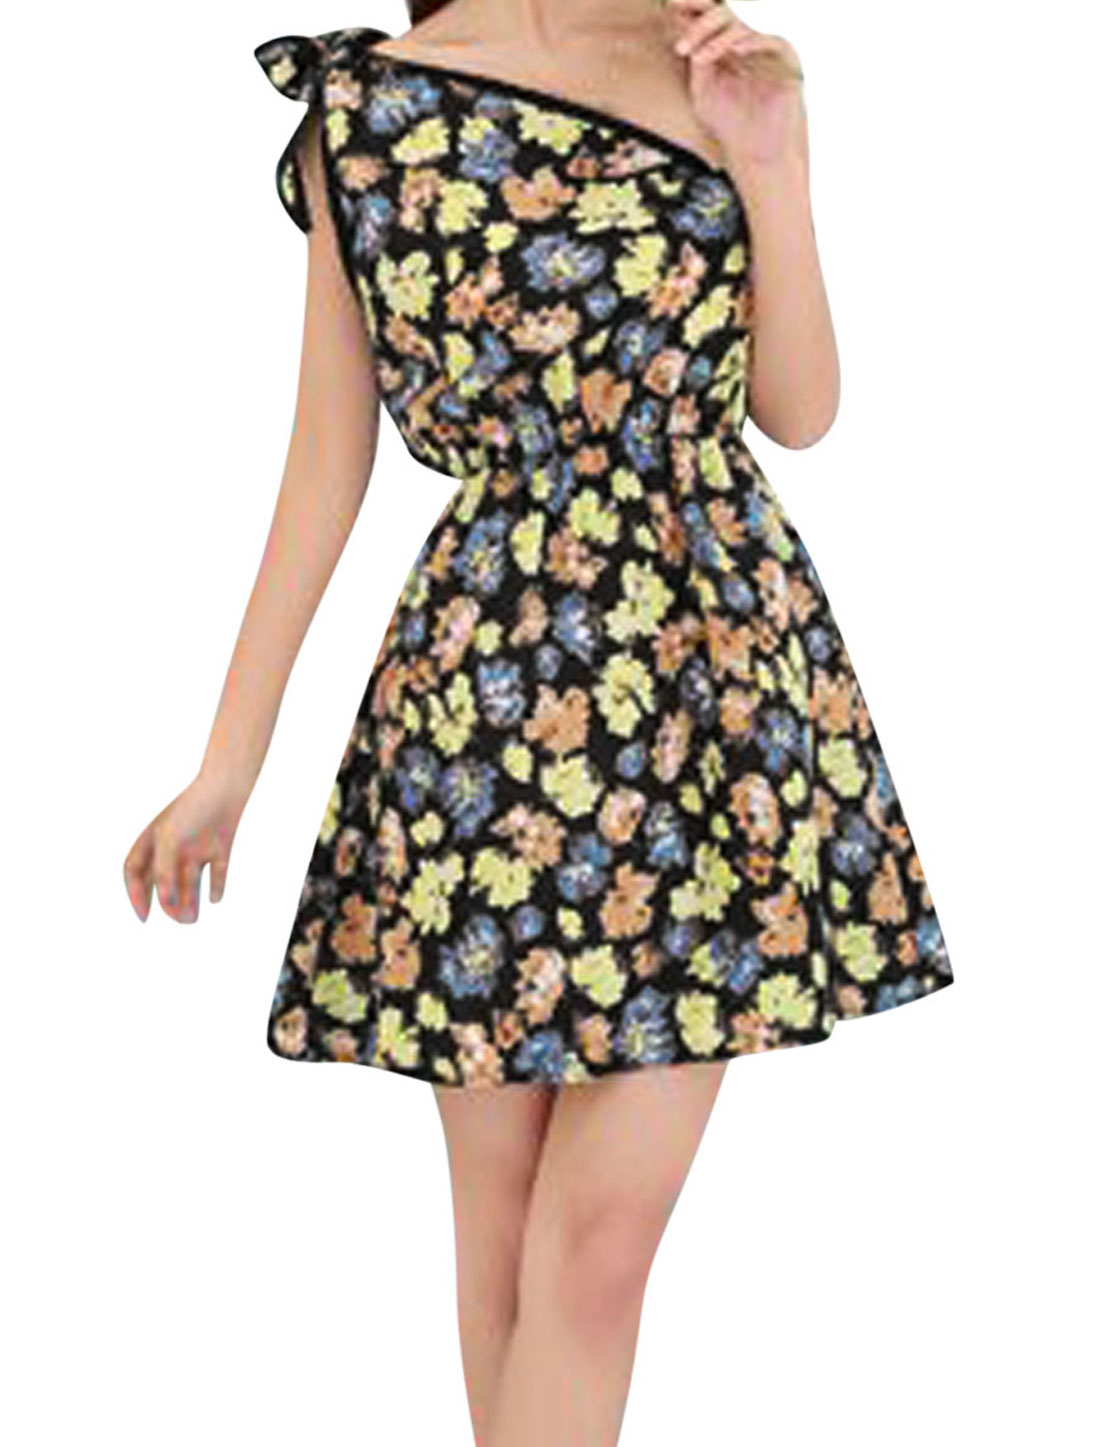 Women Elastic Waist Floral Print Self Tie Shoulder Dress Navy Blue Yellow XS